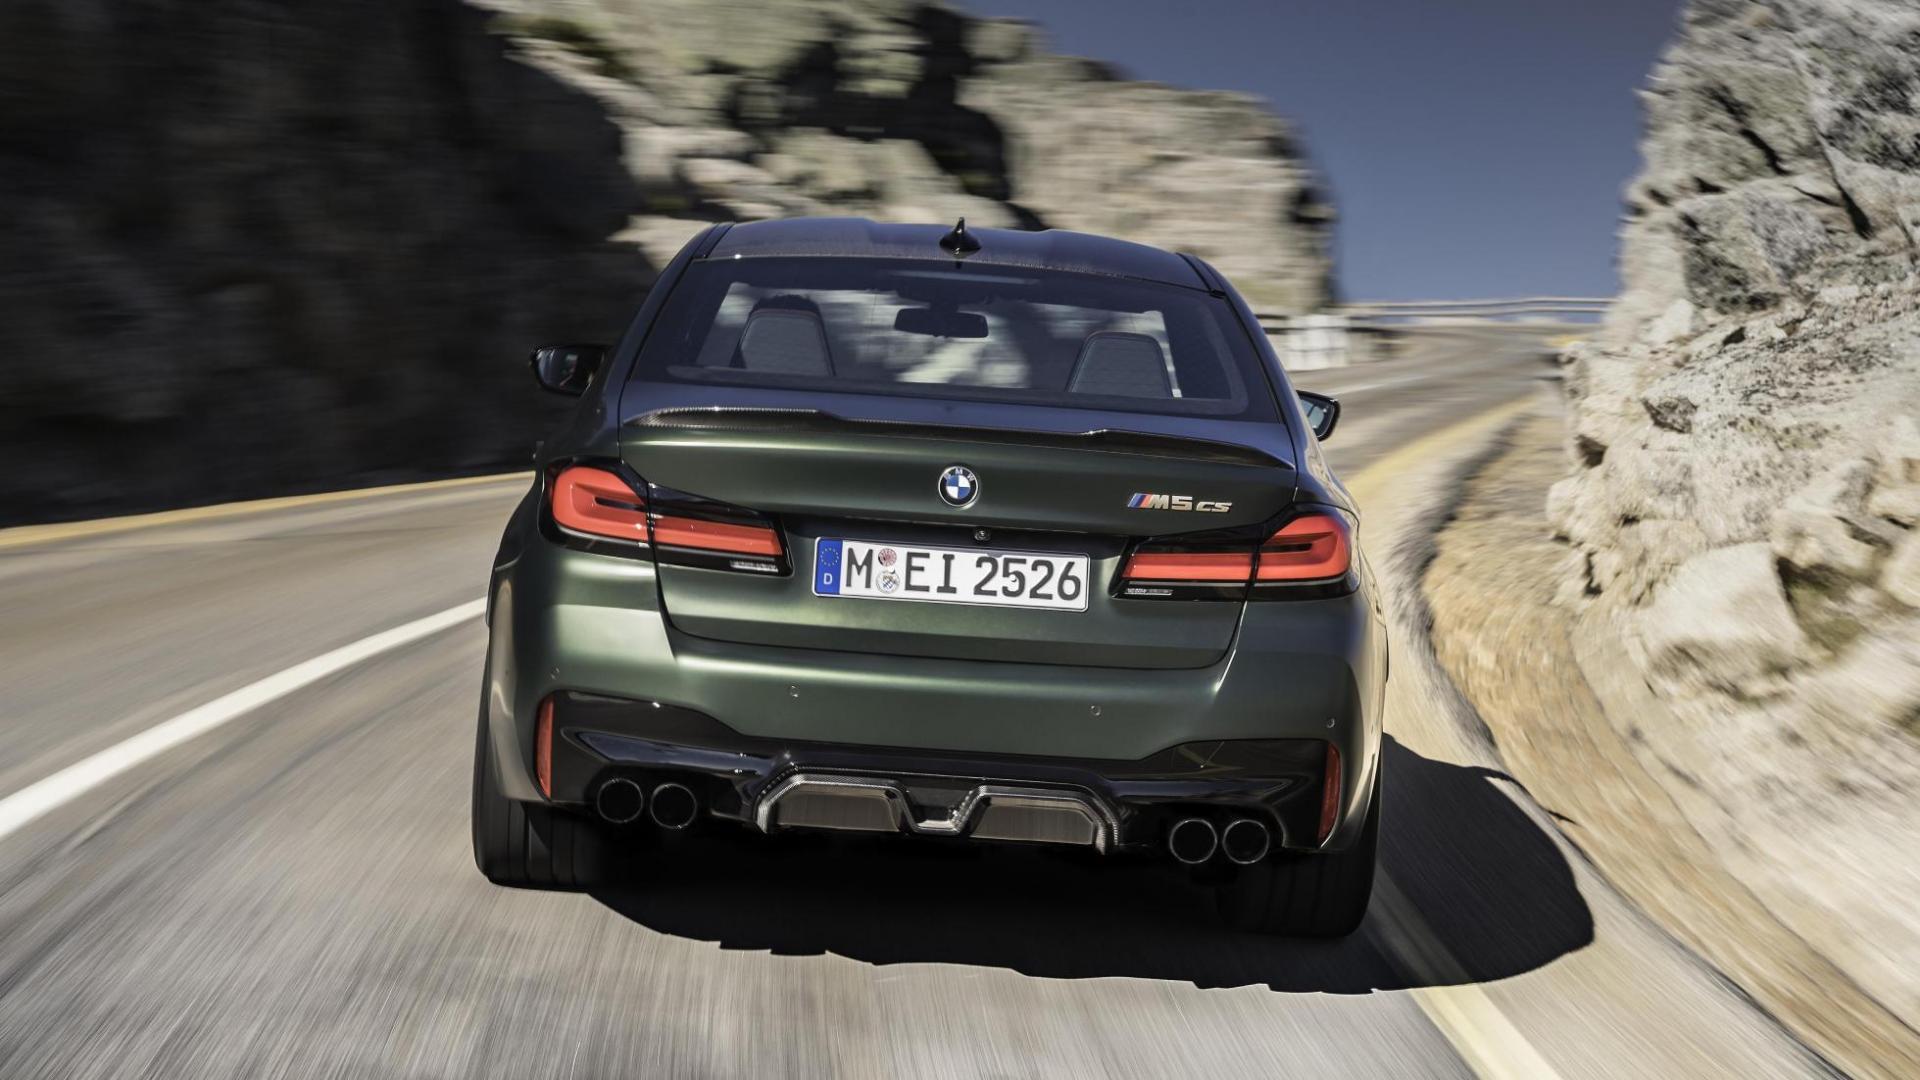 Achterkant BMW M5 CS 2021 (G30)